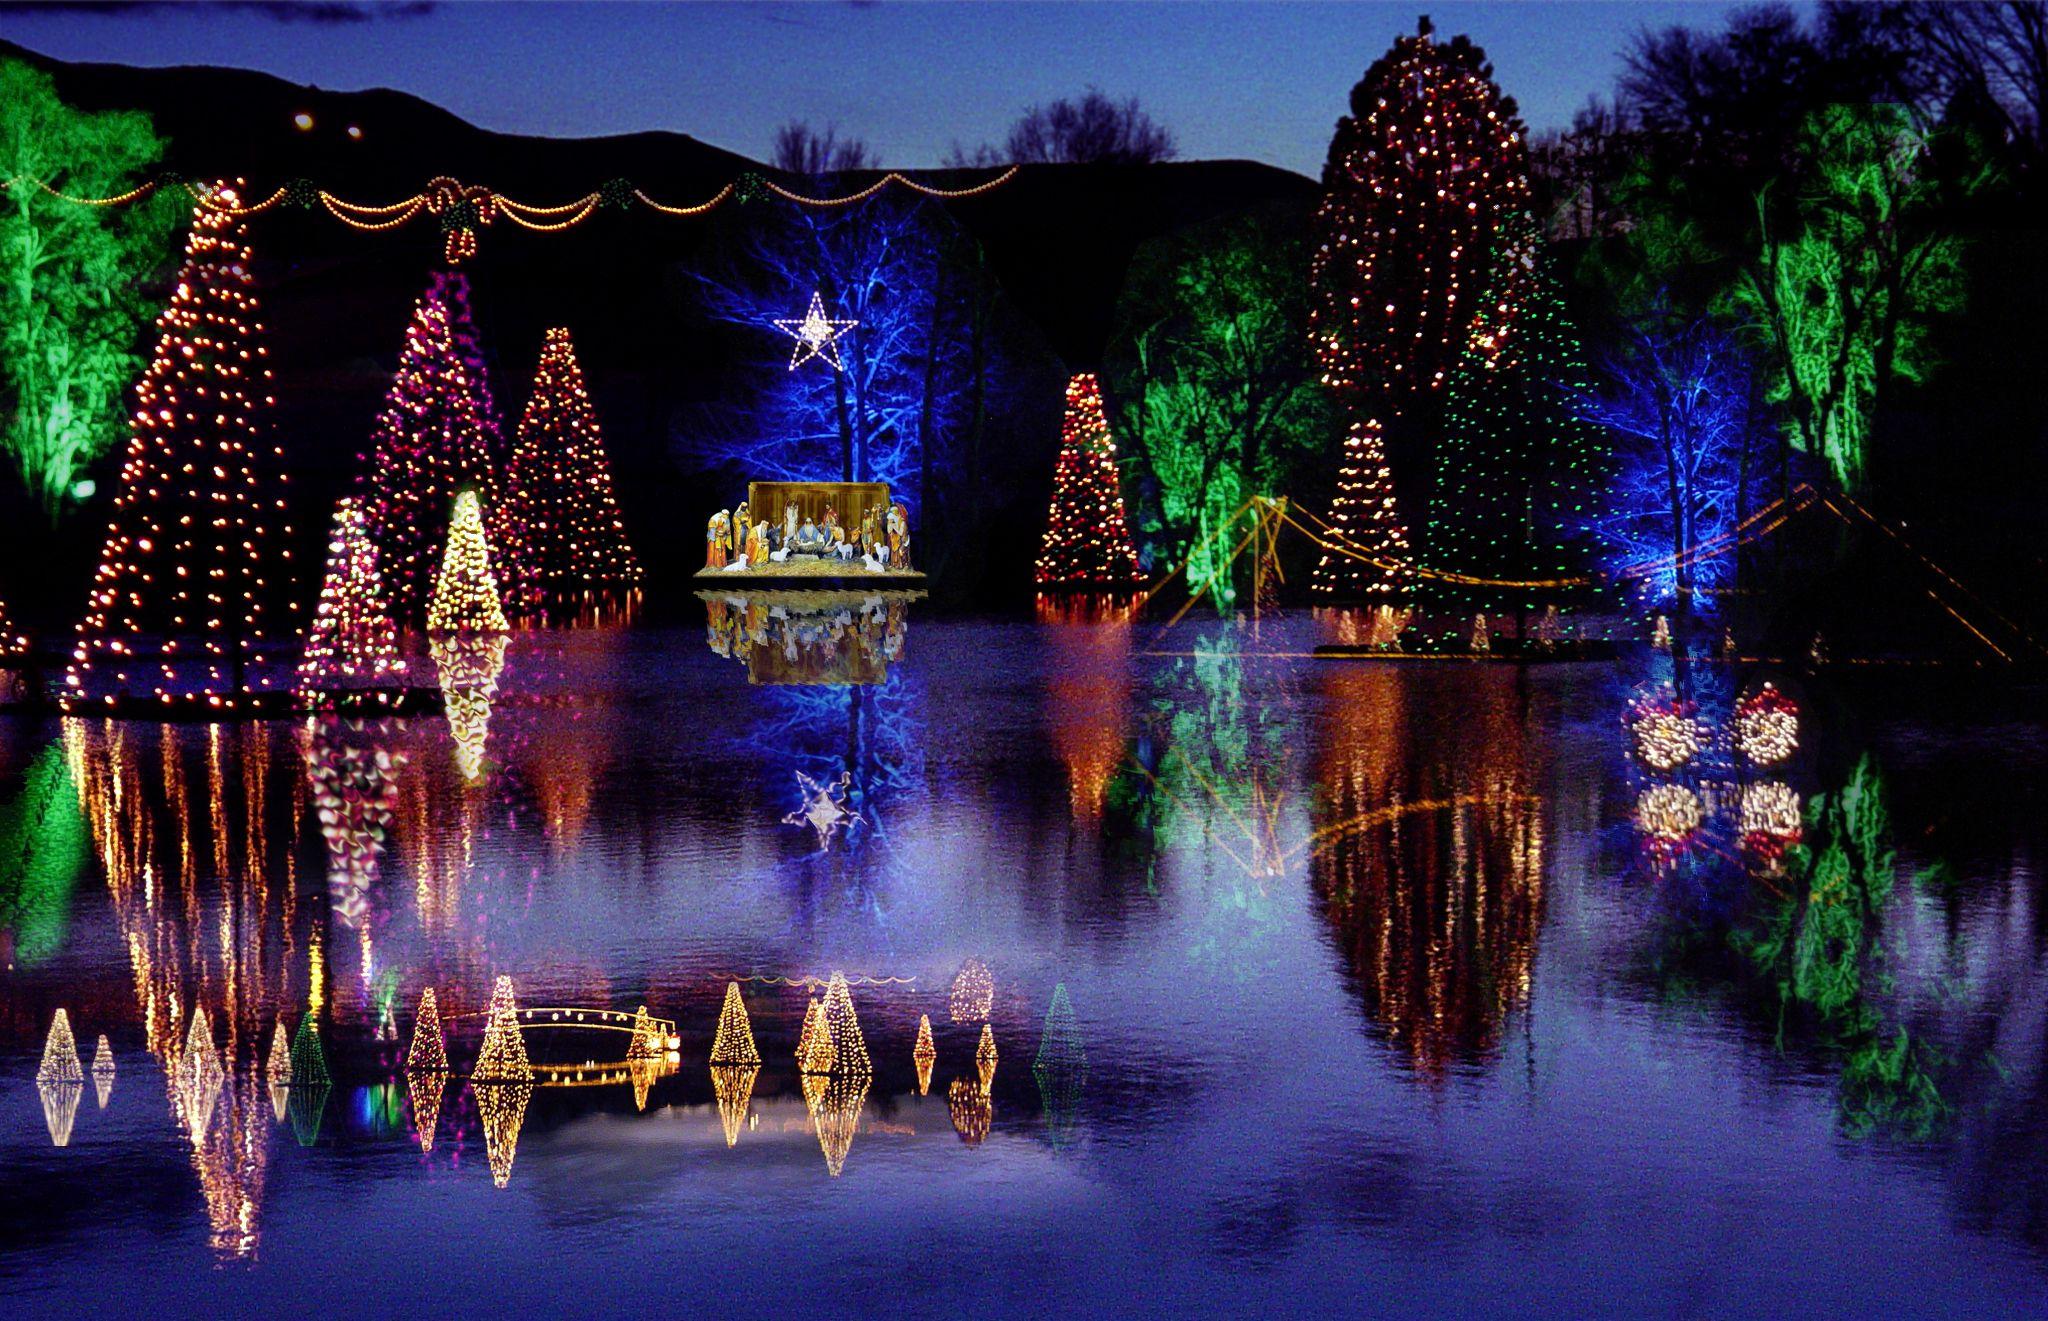 Salem Pond Holiday Lights Christmas Tree Ornaments Marina Bay Sands